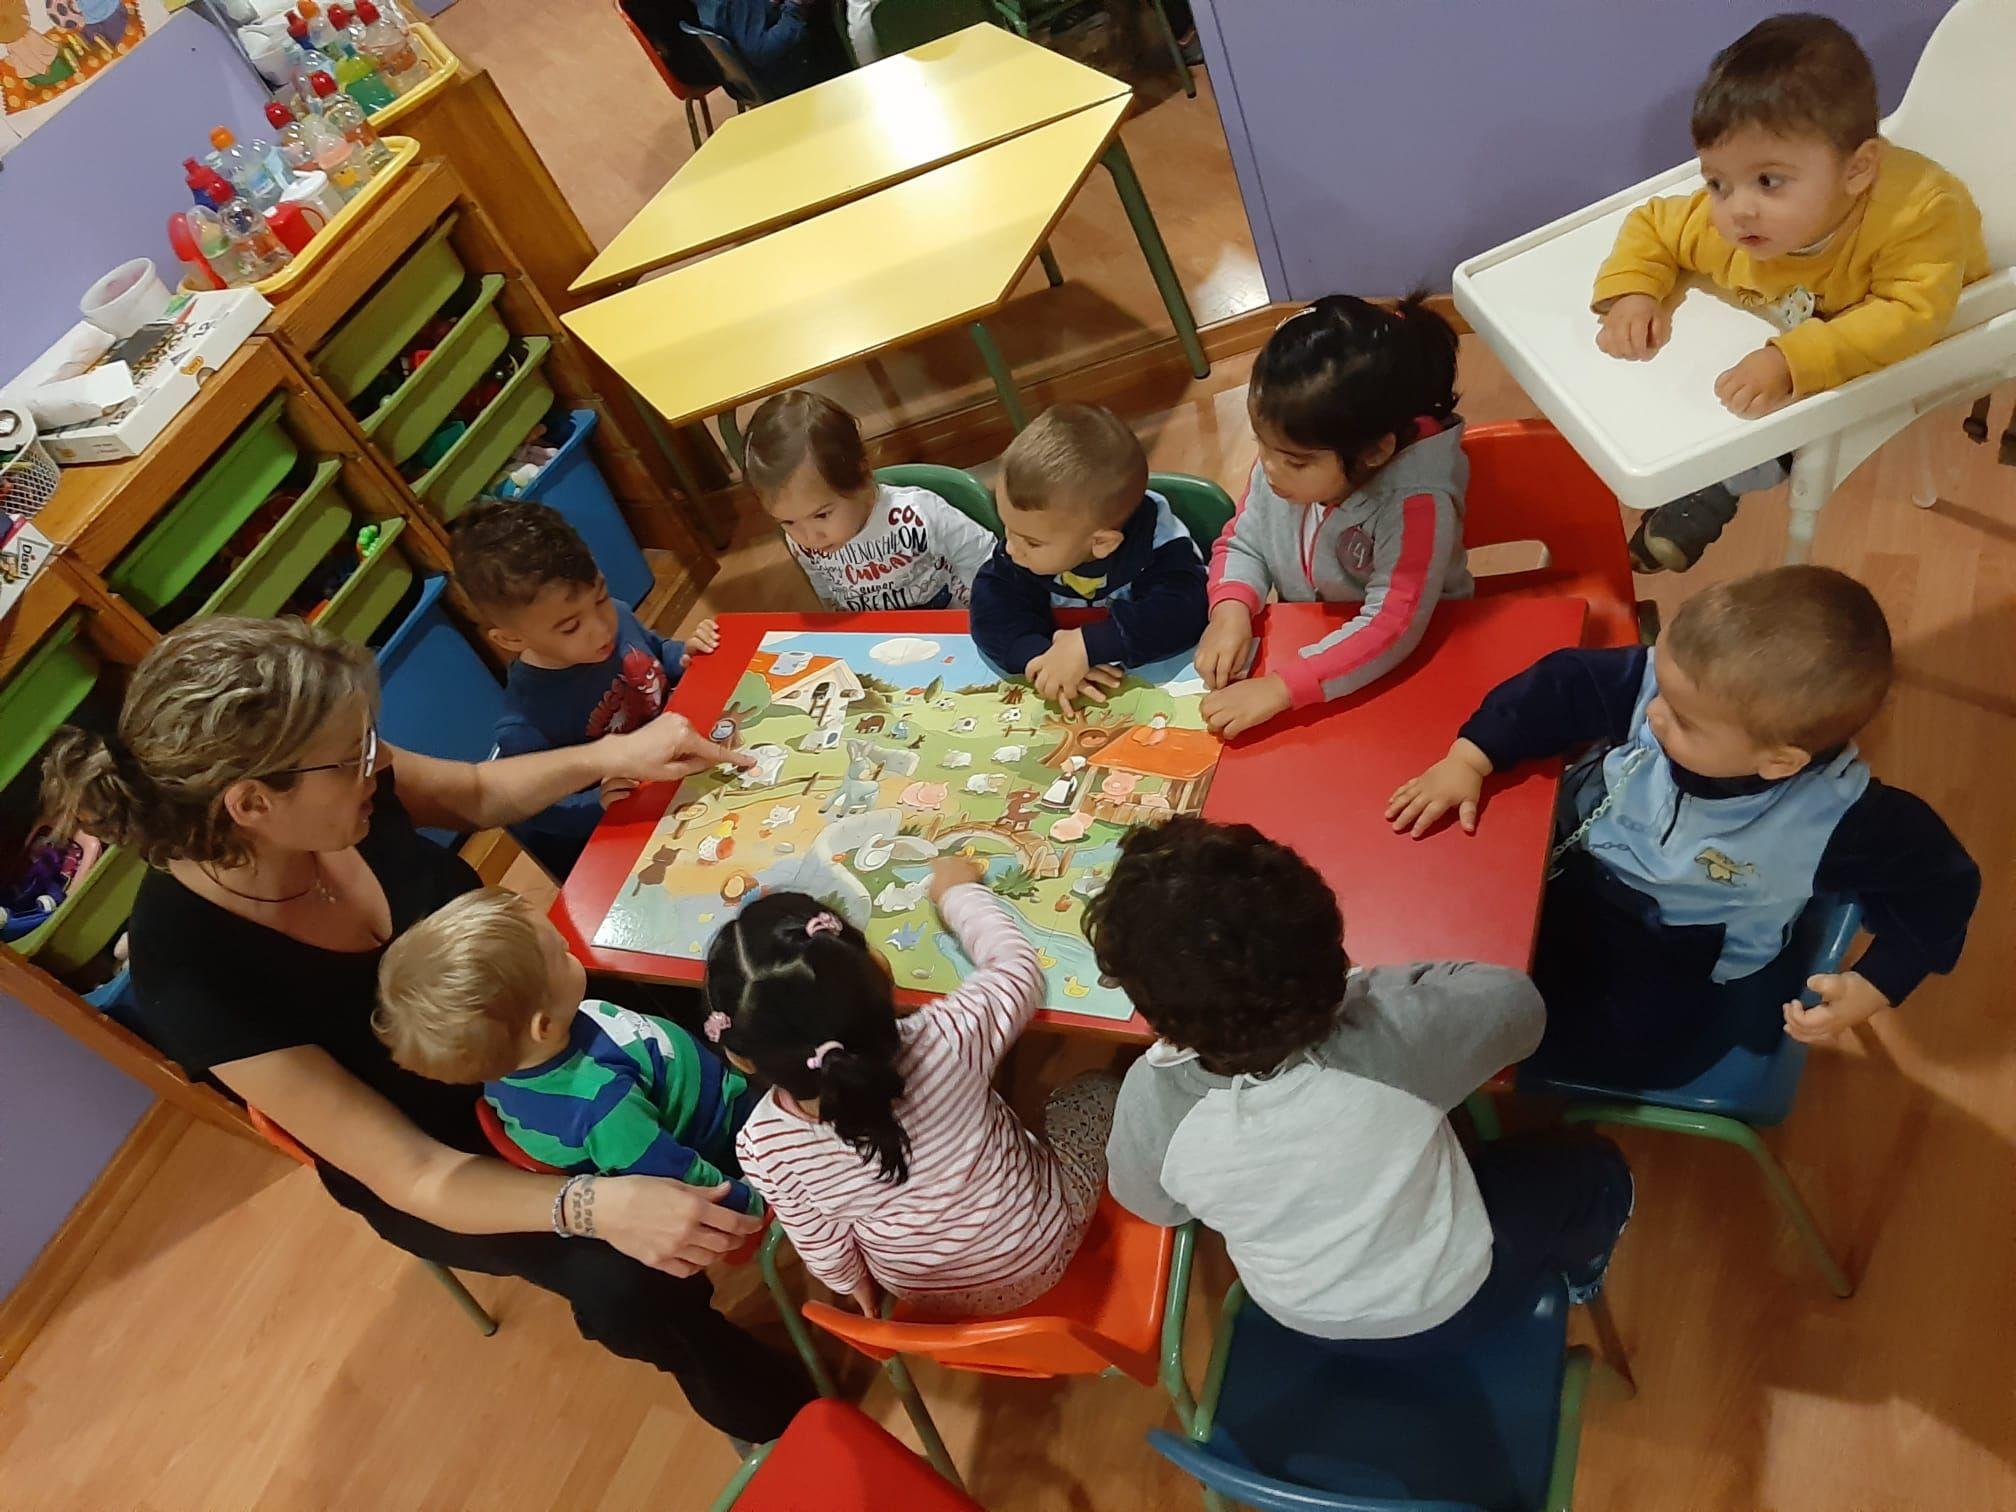 escuela infantil en Girona